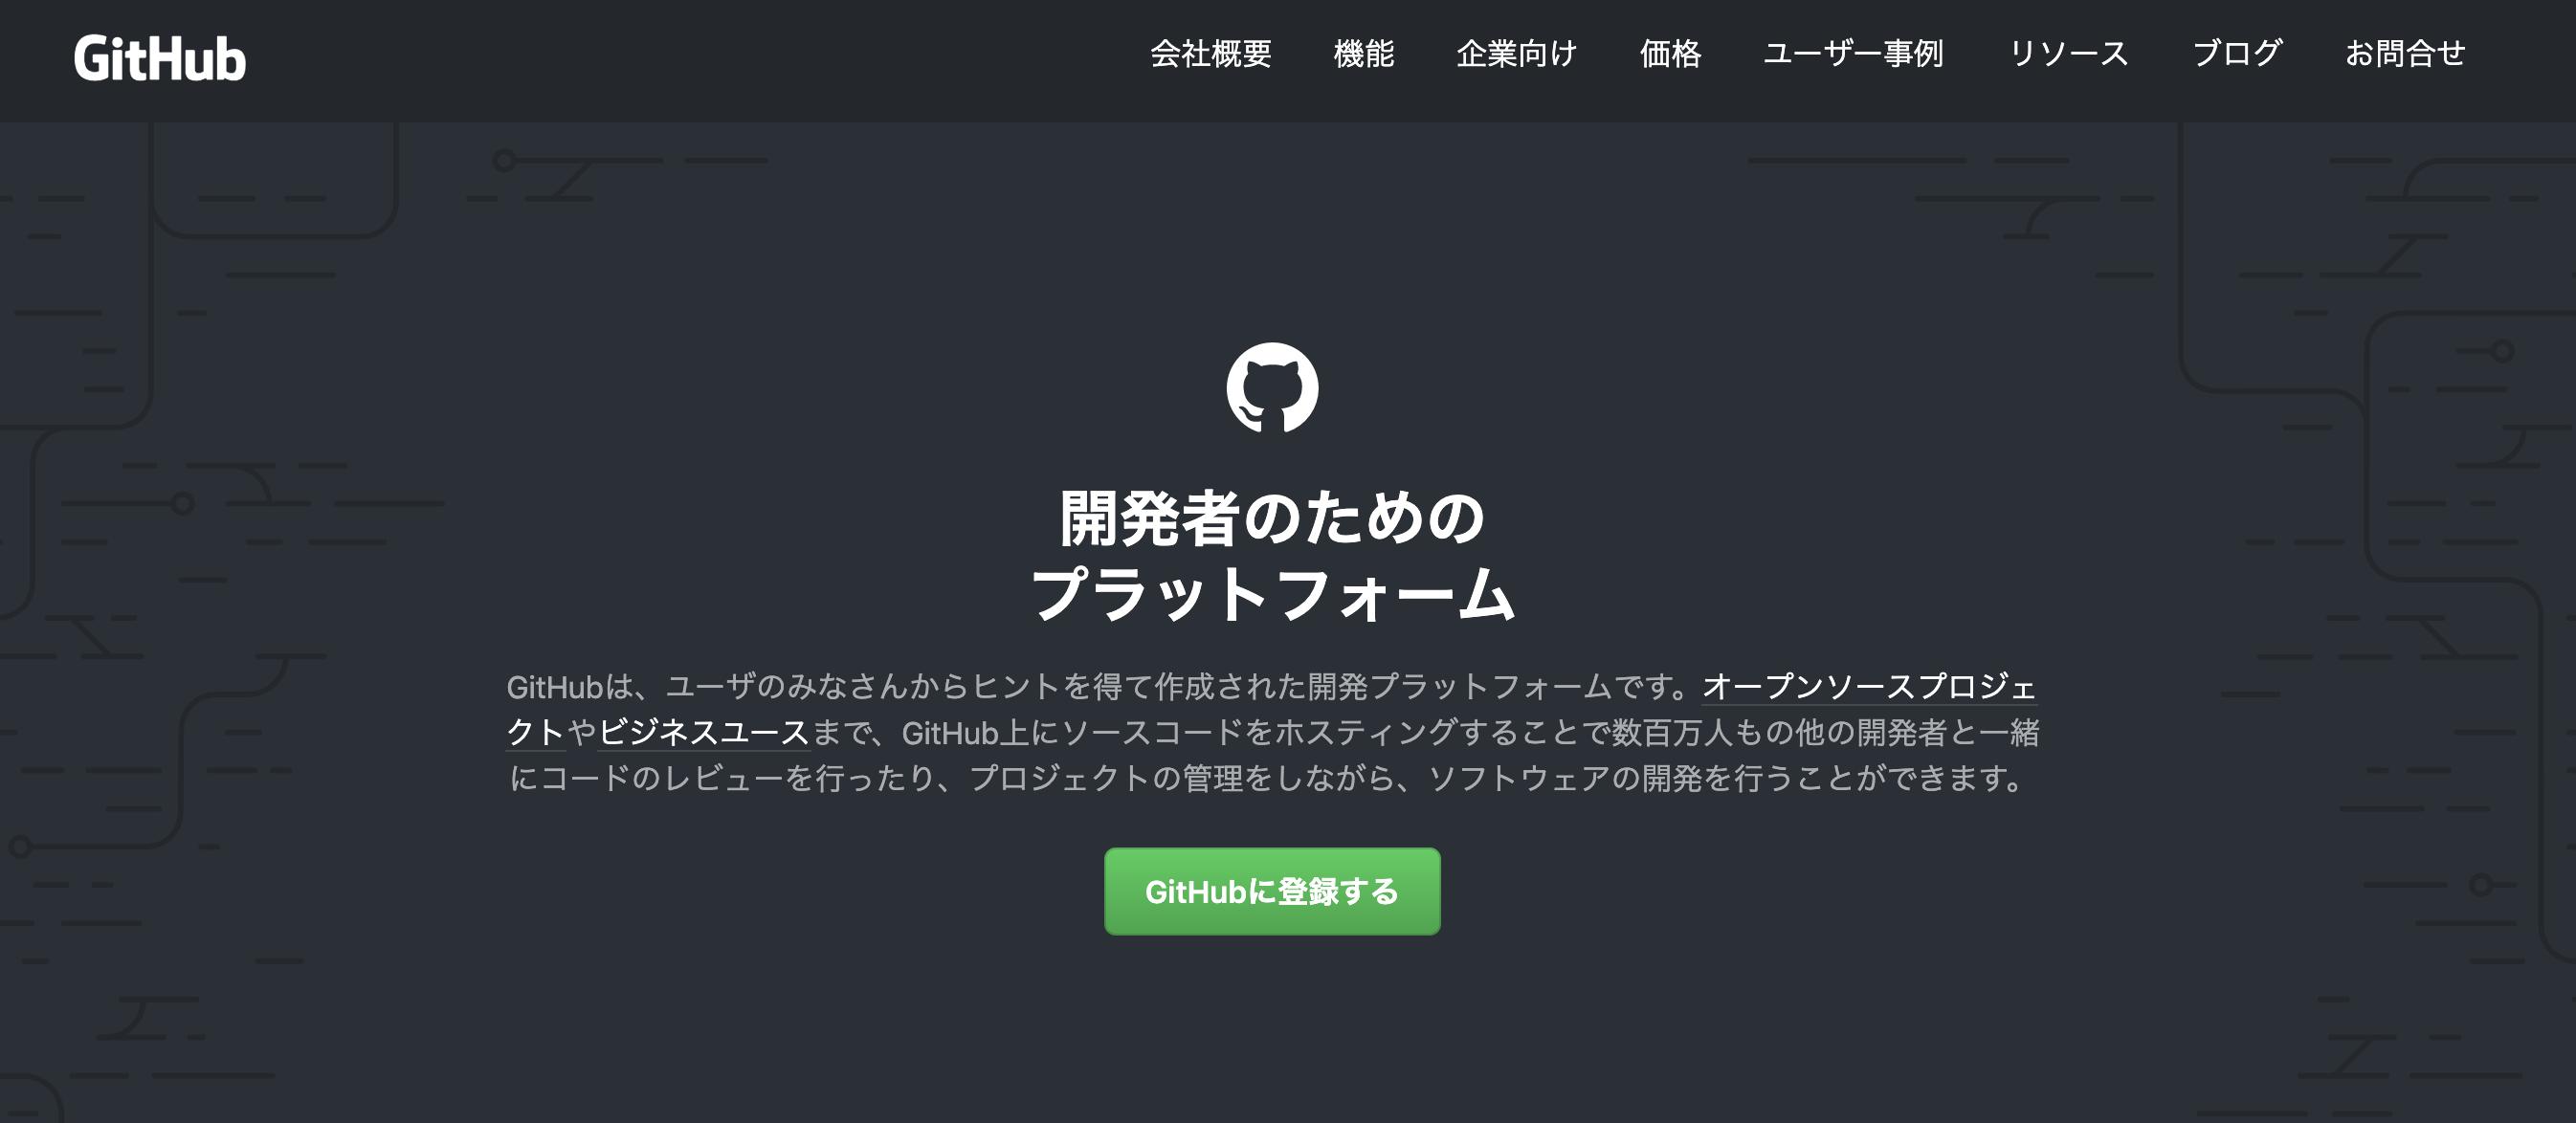 Ruby on Railsを使ったGithub